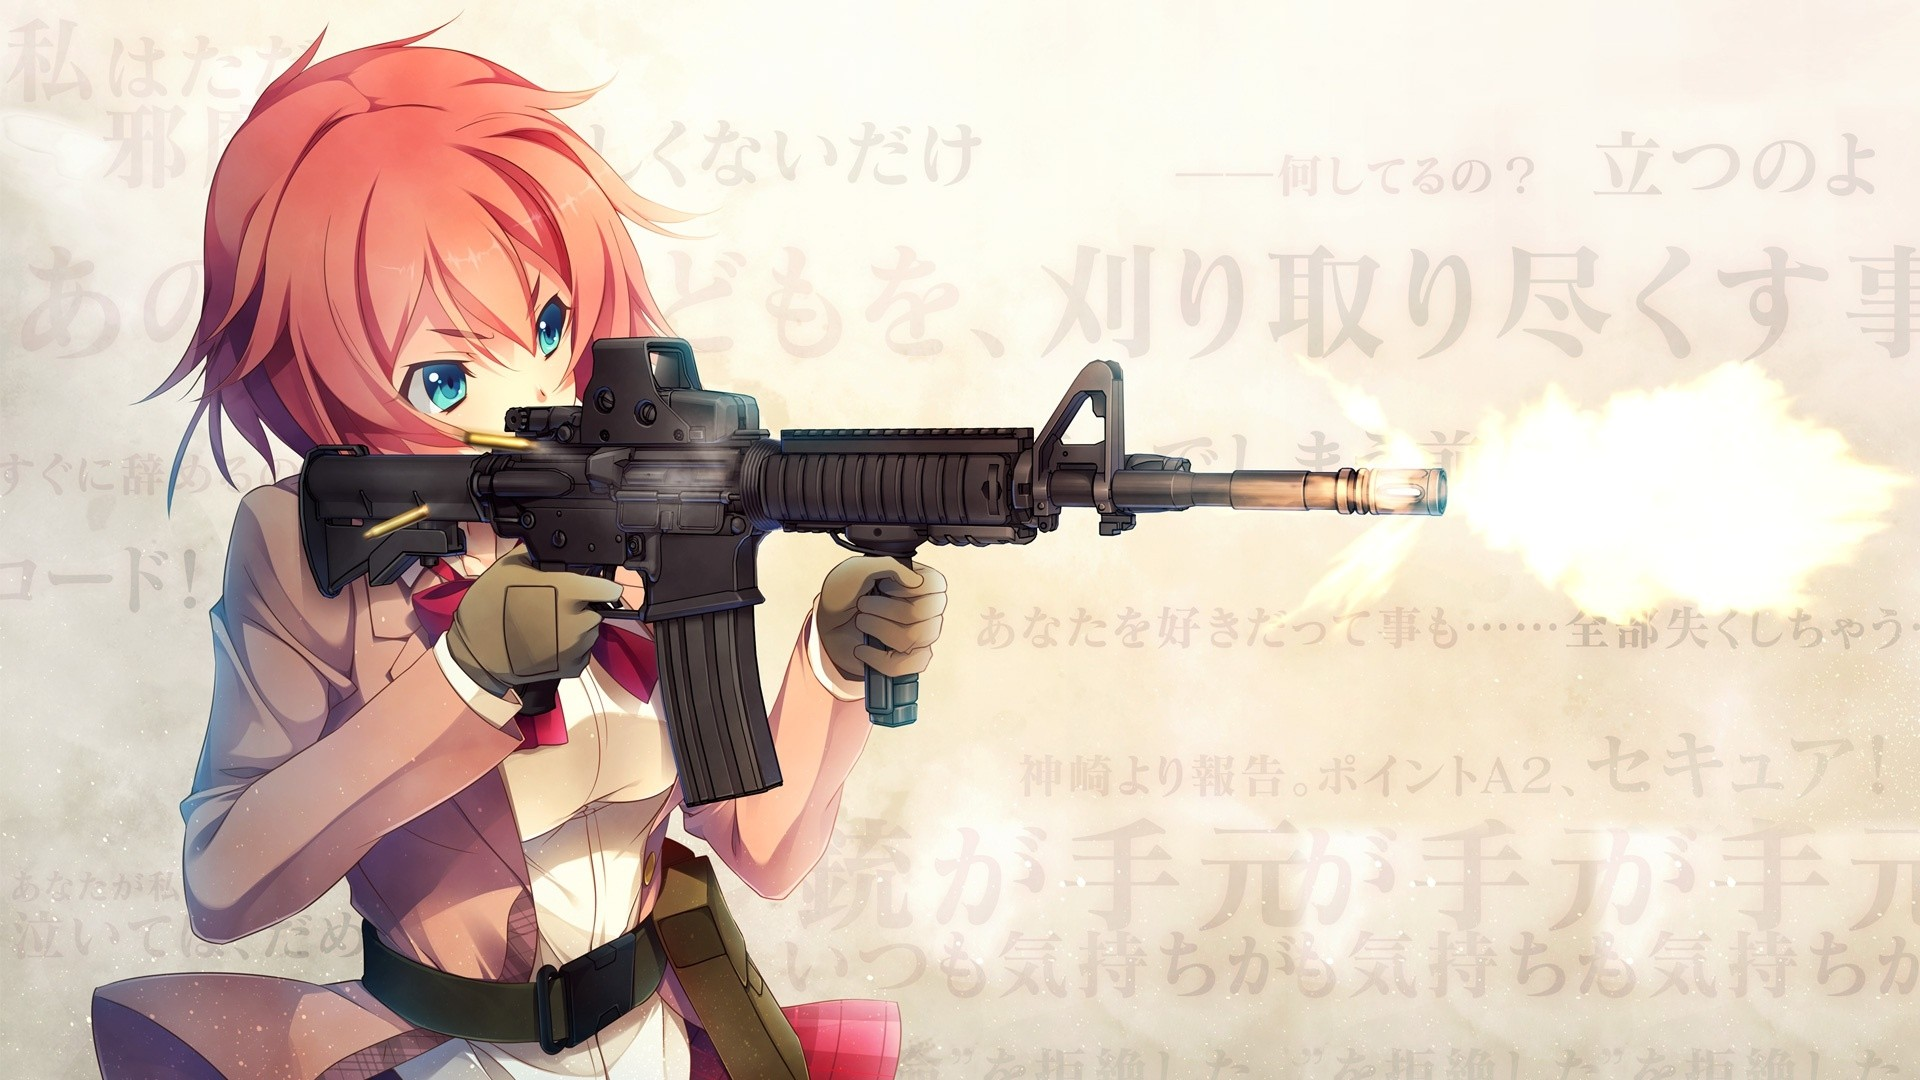 Anime Girls With Guns Wallpaper Free